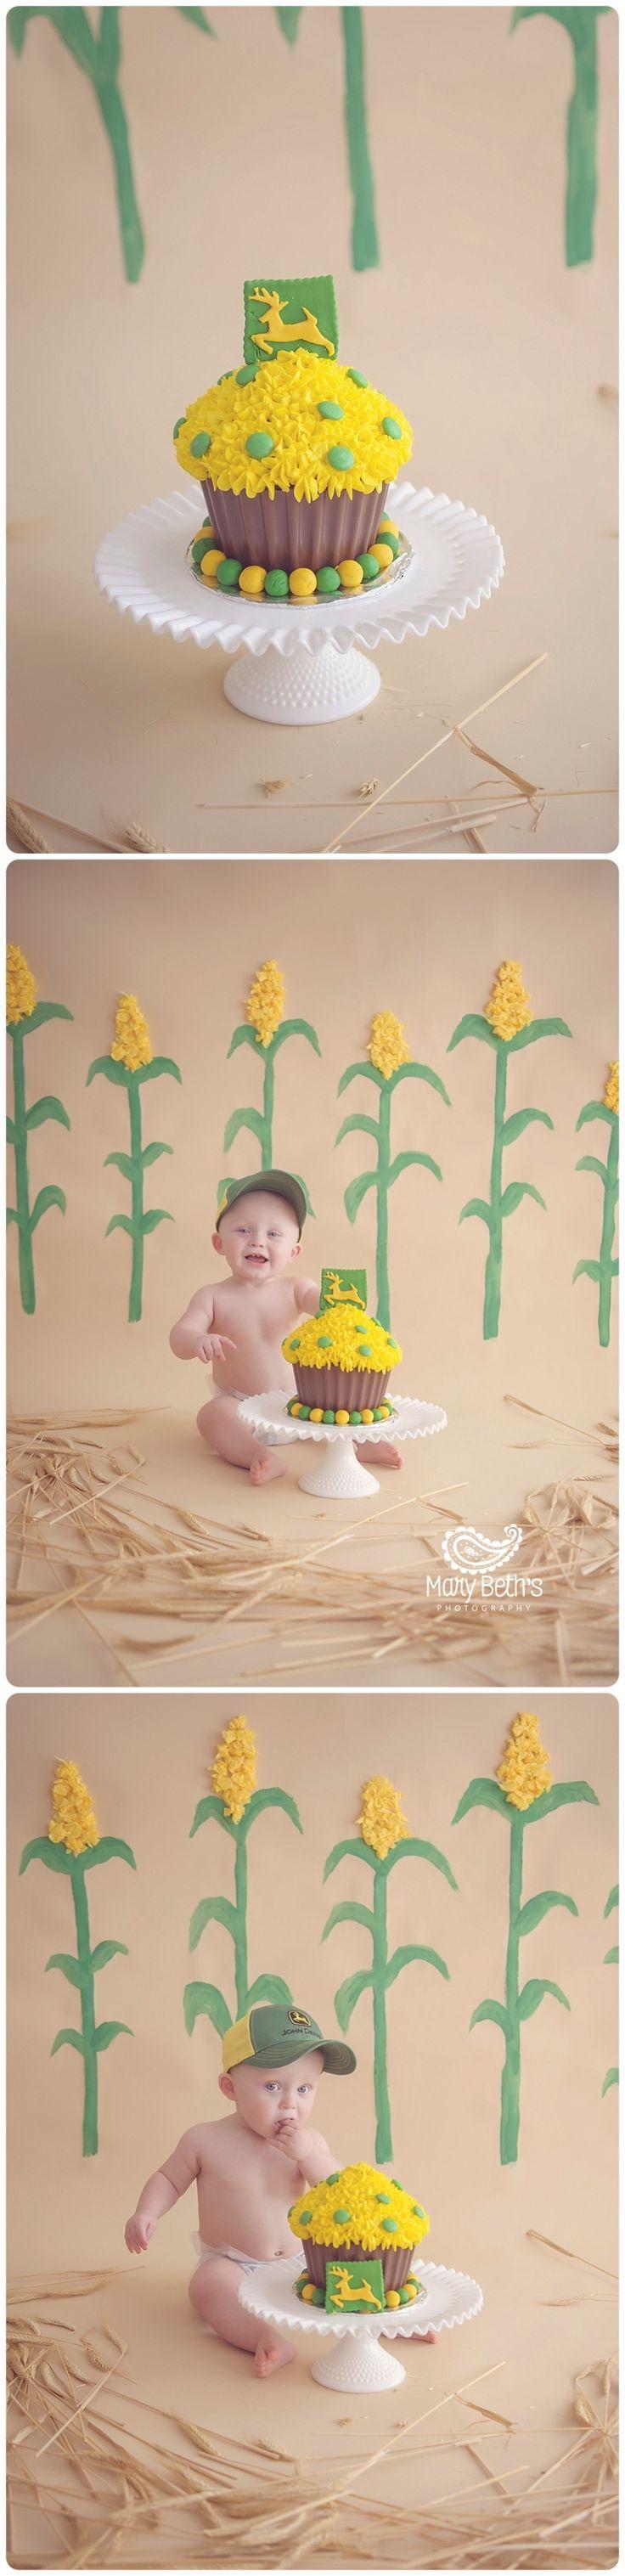 Samuel's John Deere 1st Birthday and Cake Smash Portraits for Mary Beth's Photography in Augusta, GA | Augusta GA Newborn Photographer, Augusta GA Family Photography #1stbirthday #cakesmash #customphotographysets #augustaga #johndeere